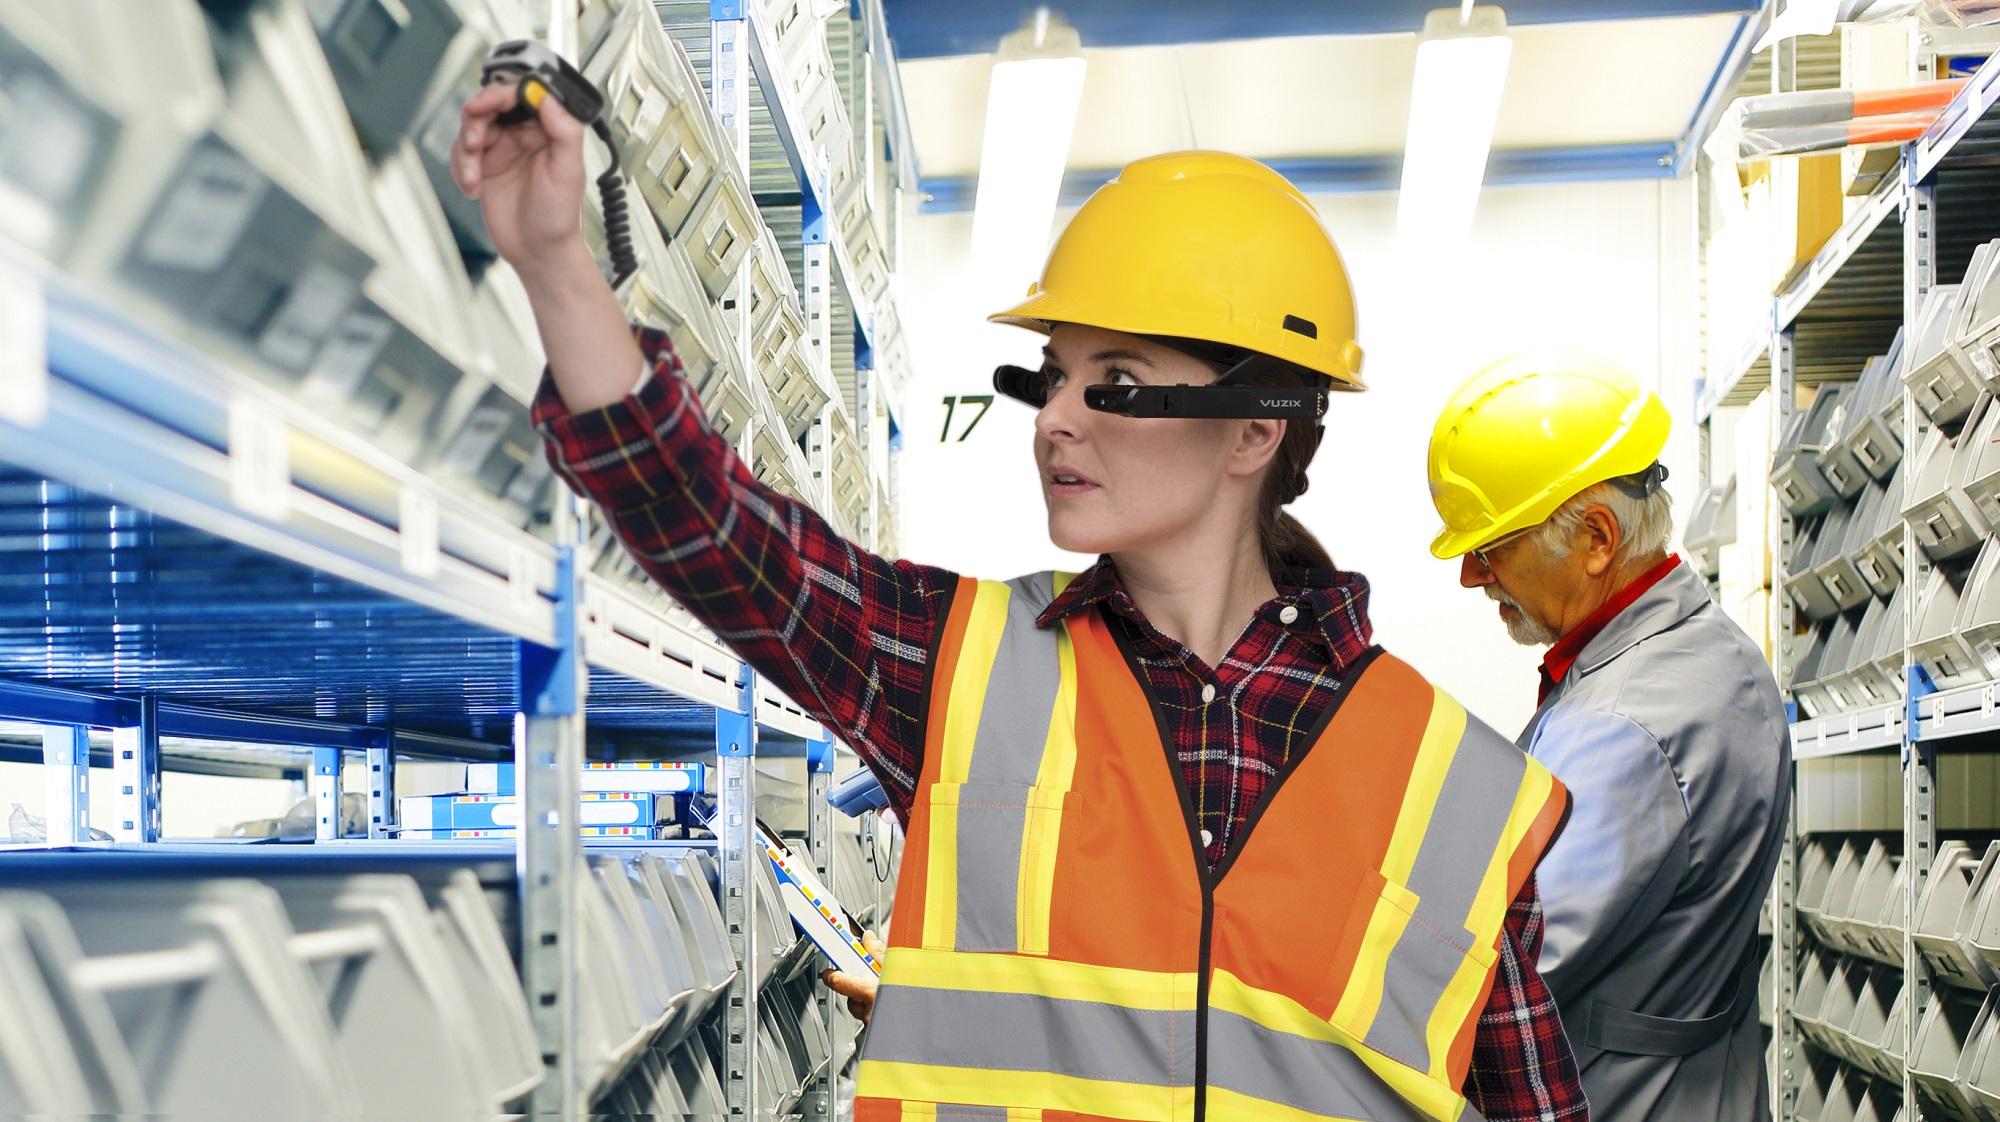 Warehouse worker wearing Vuzix smart glasses